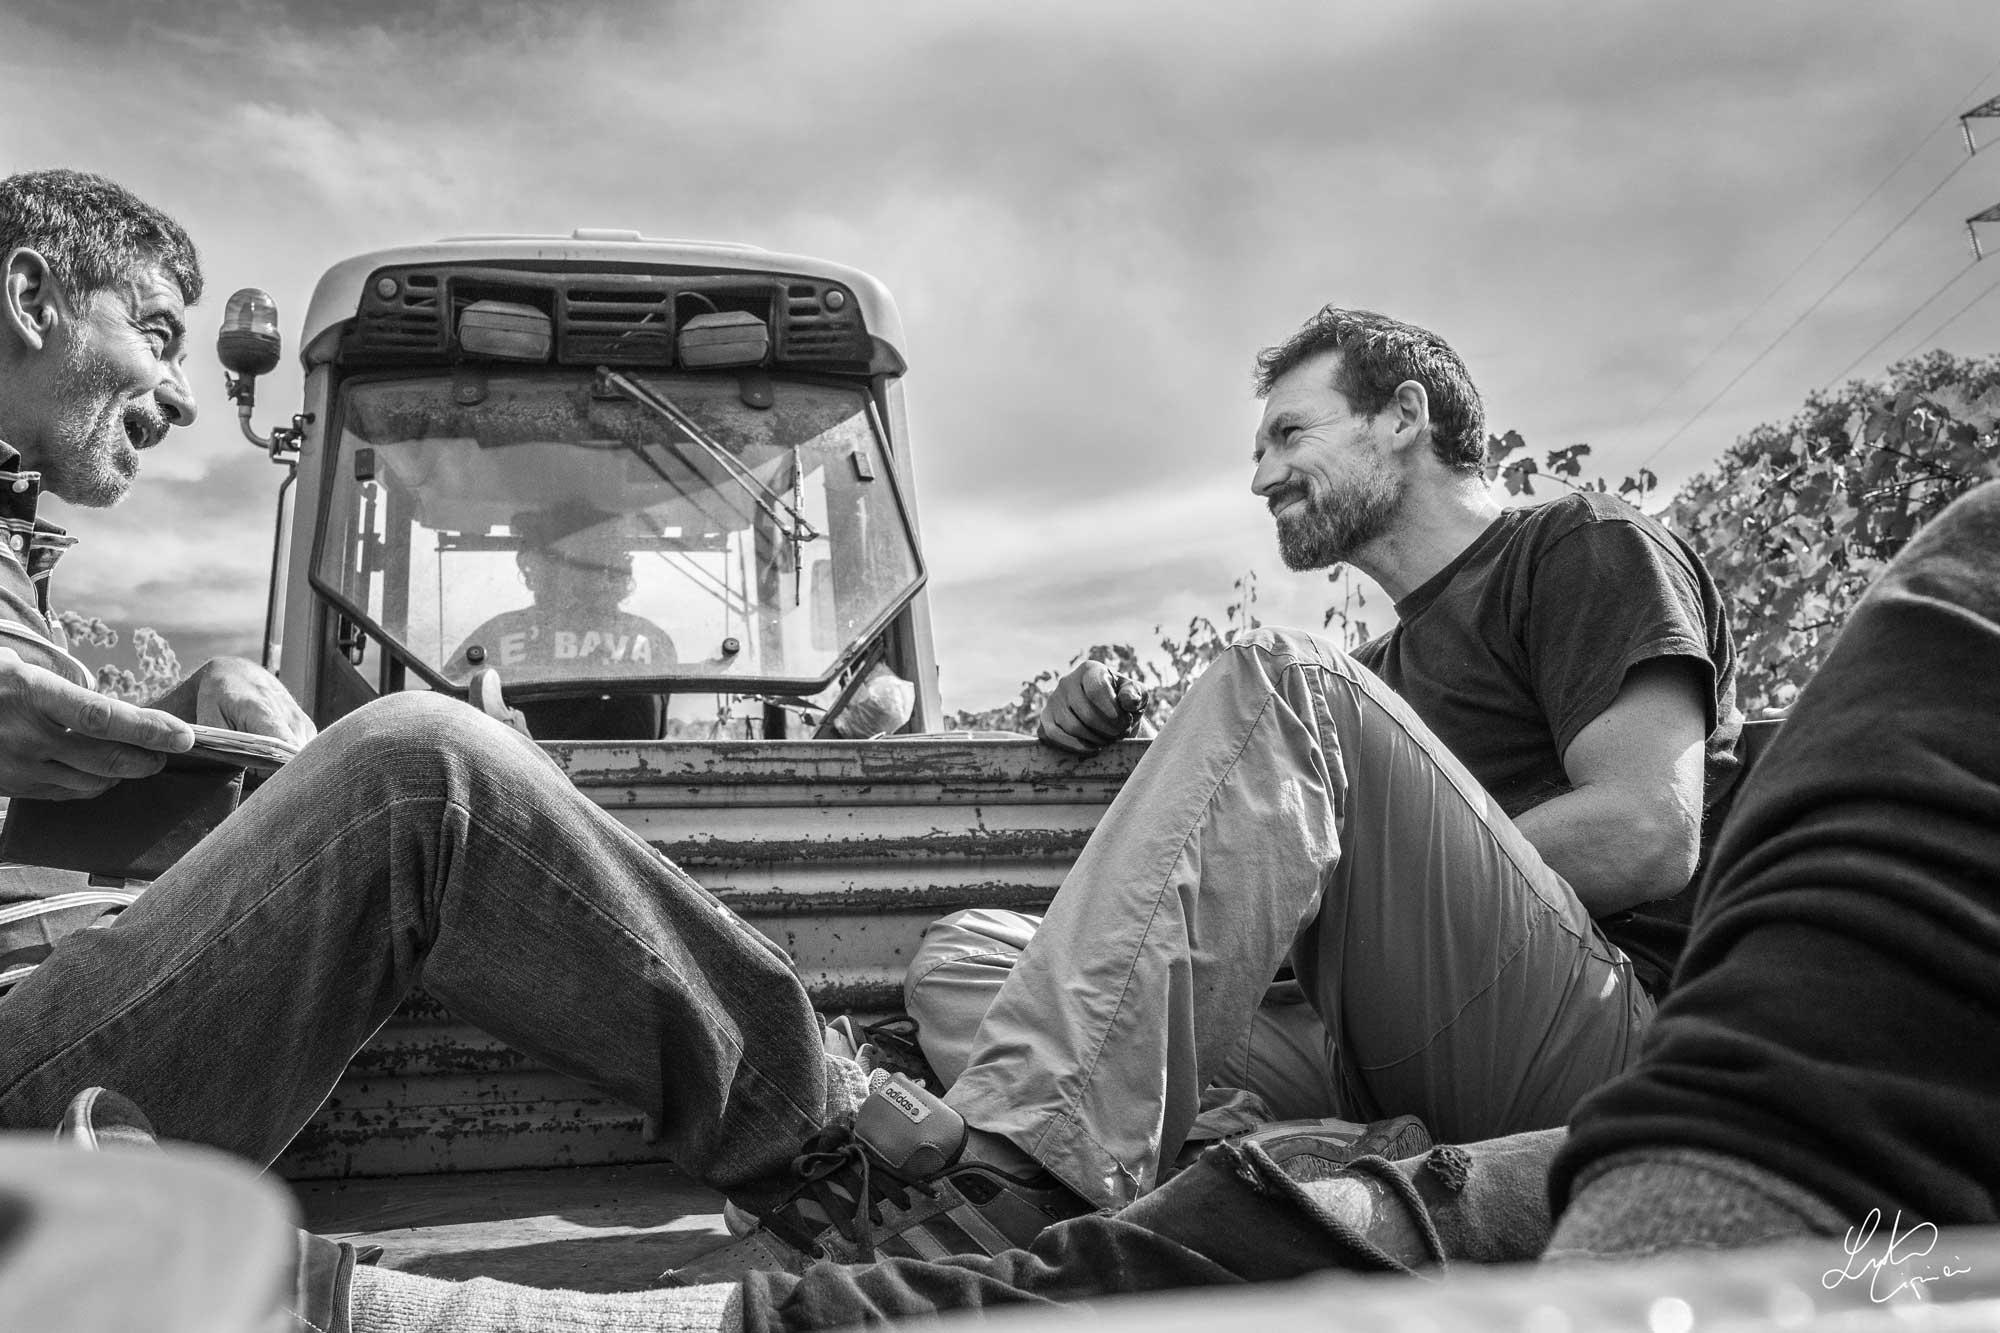 persone sedute su trattore